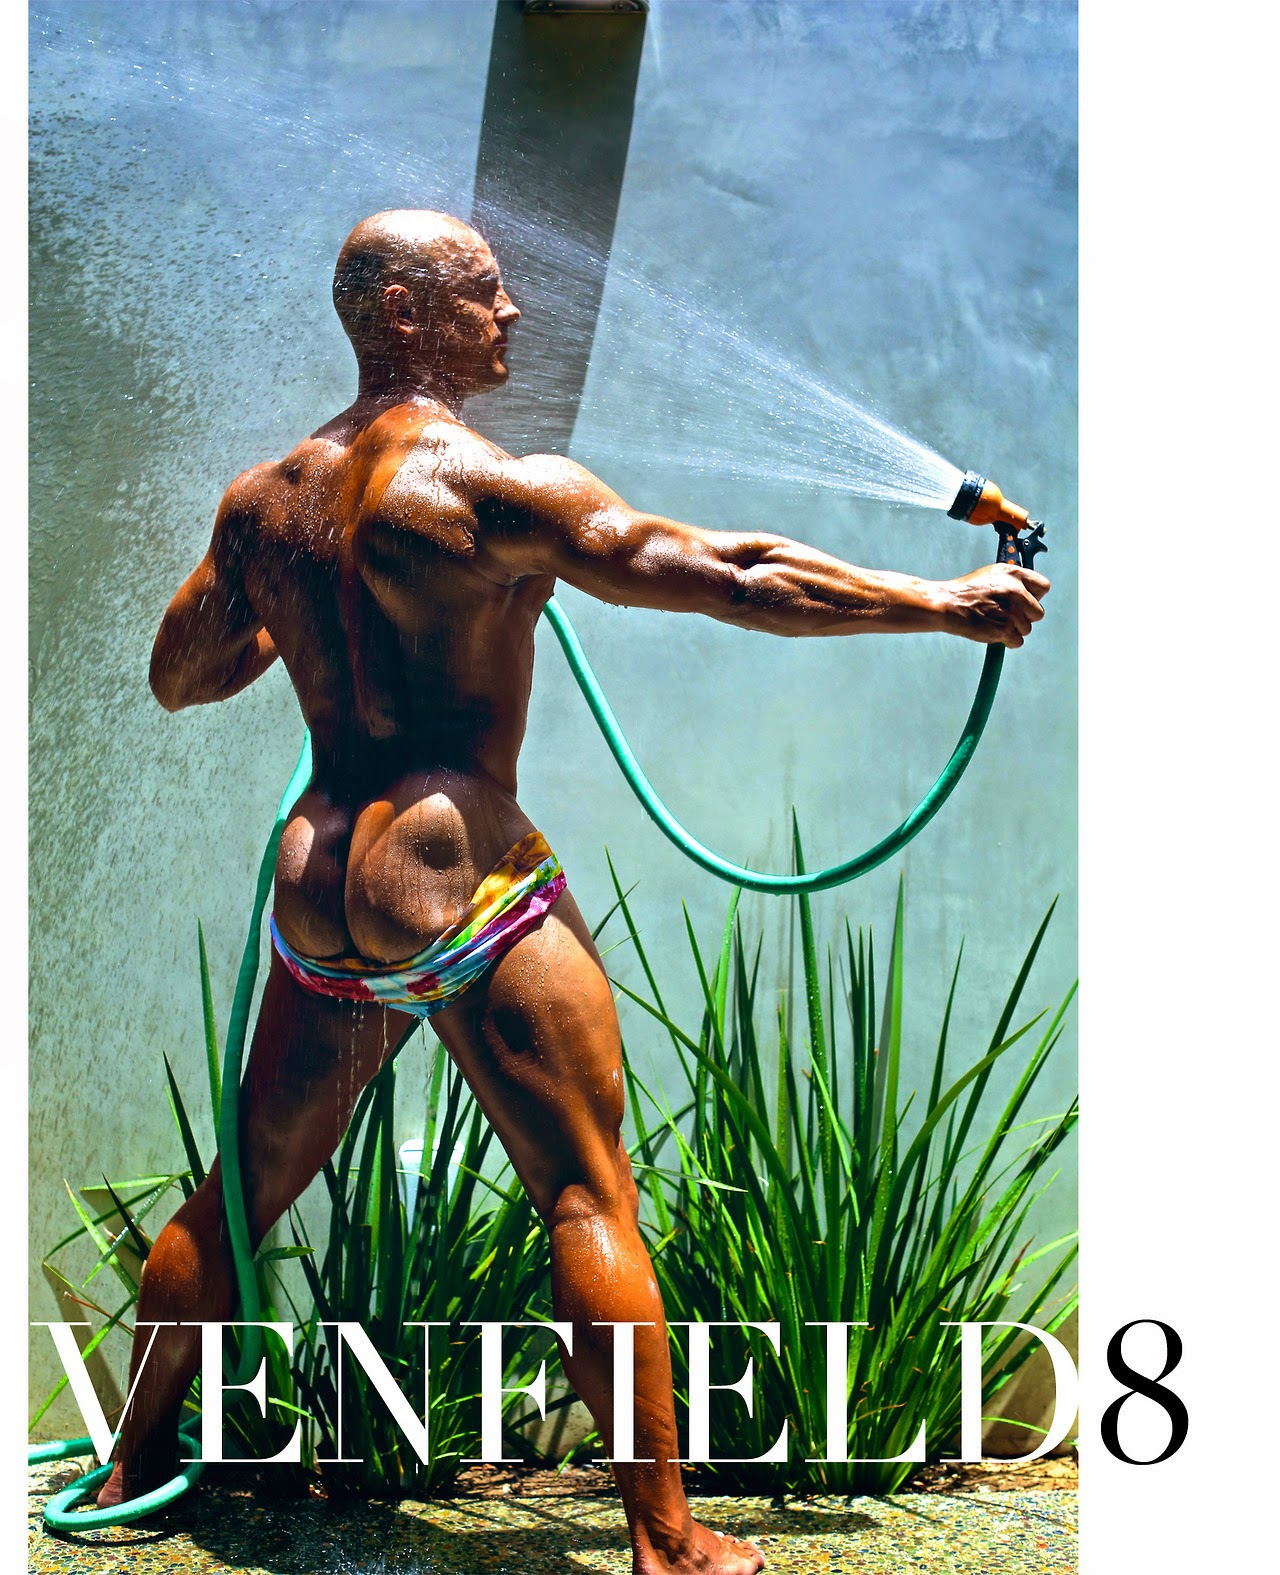 venfield8